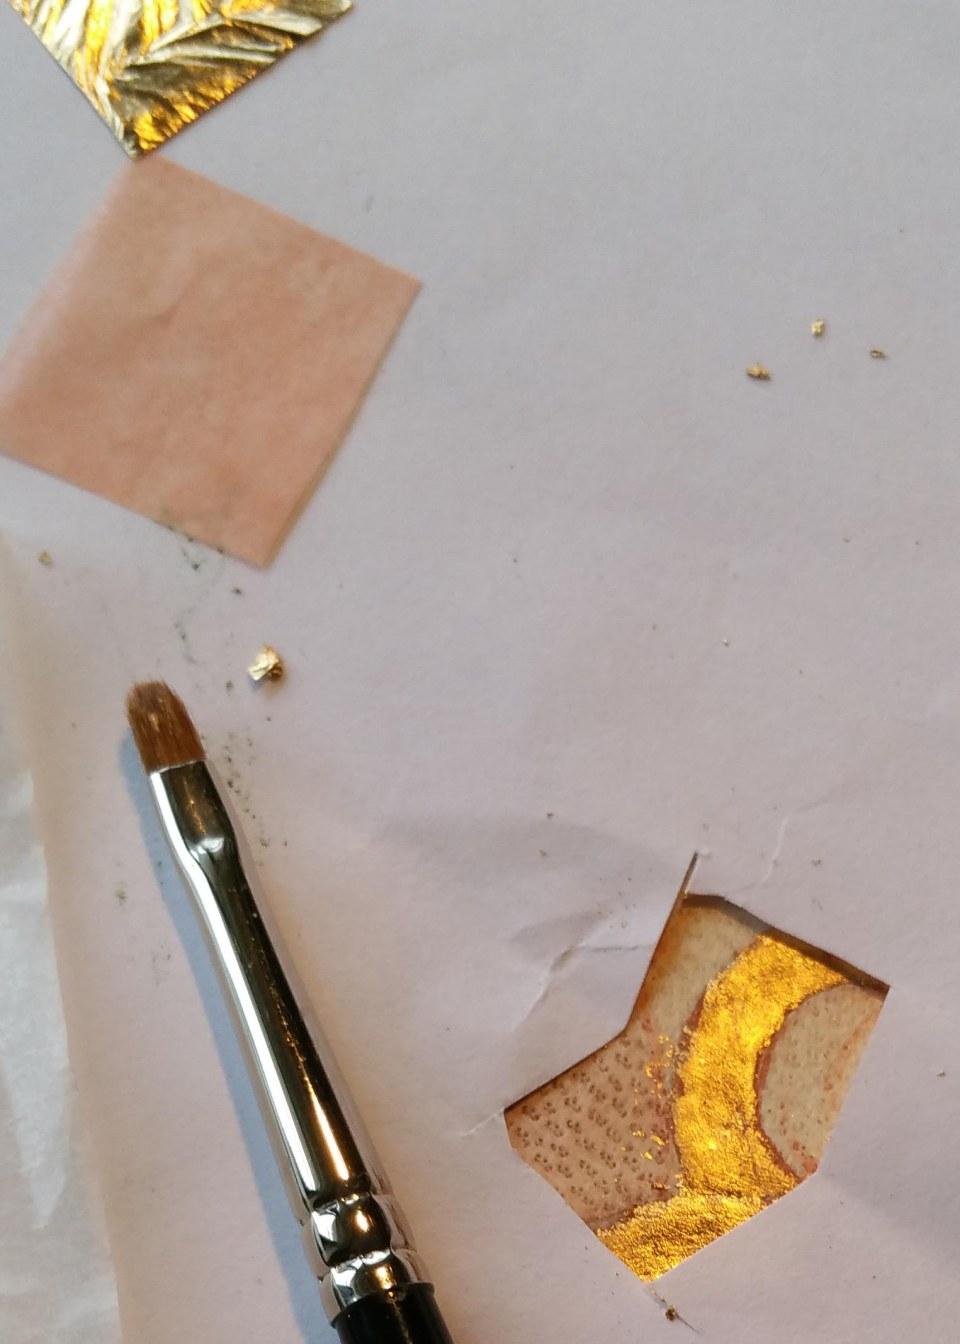 gold leaf on vellum